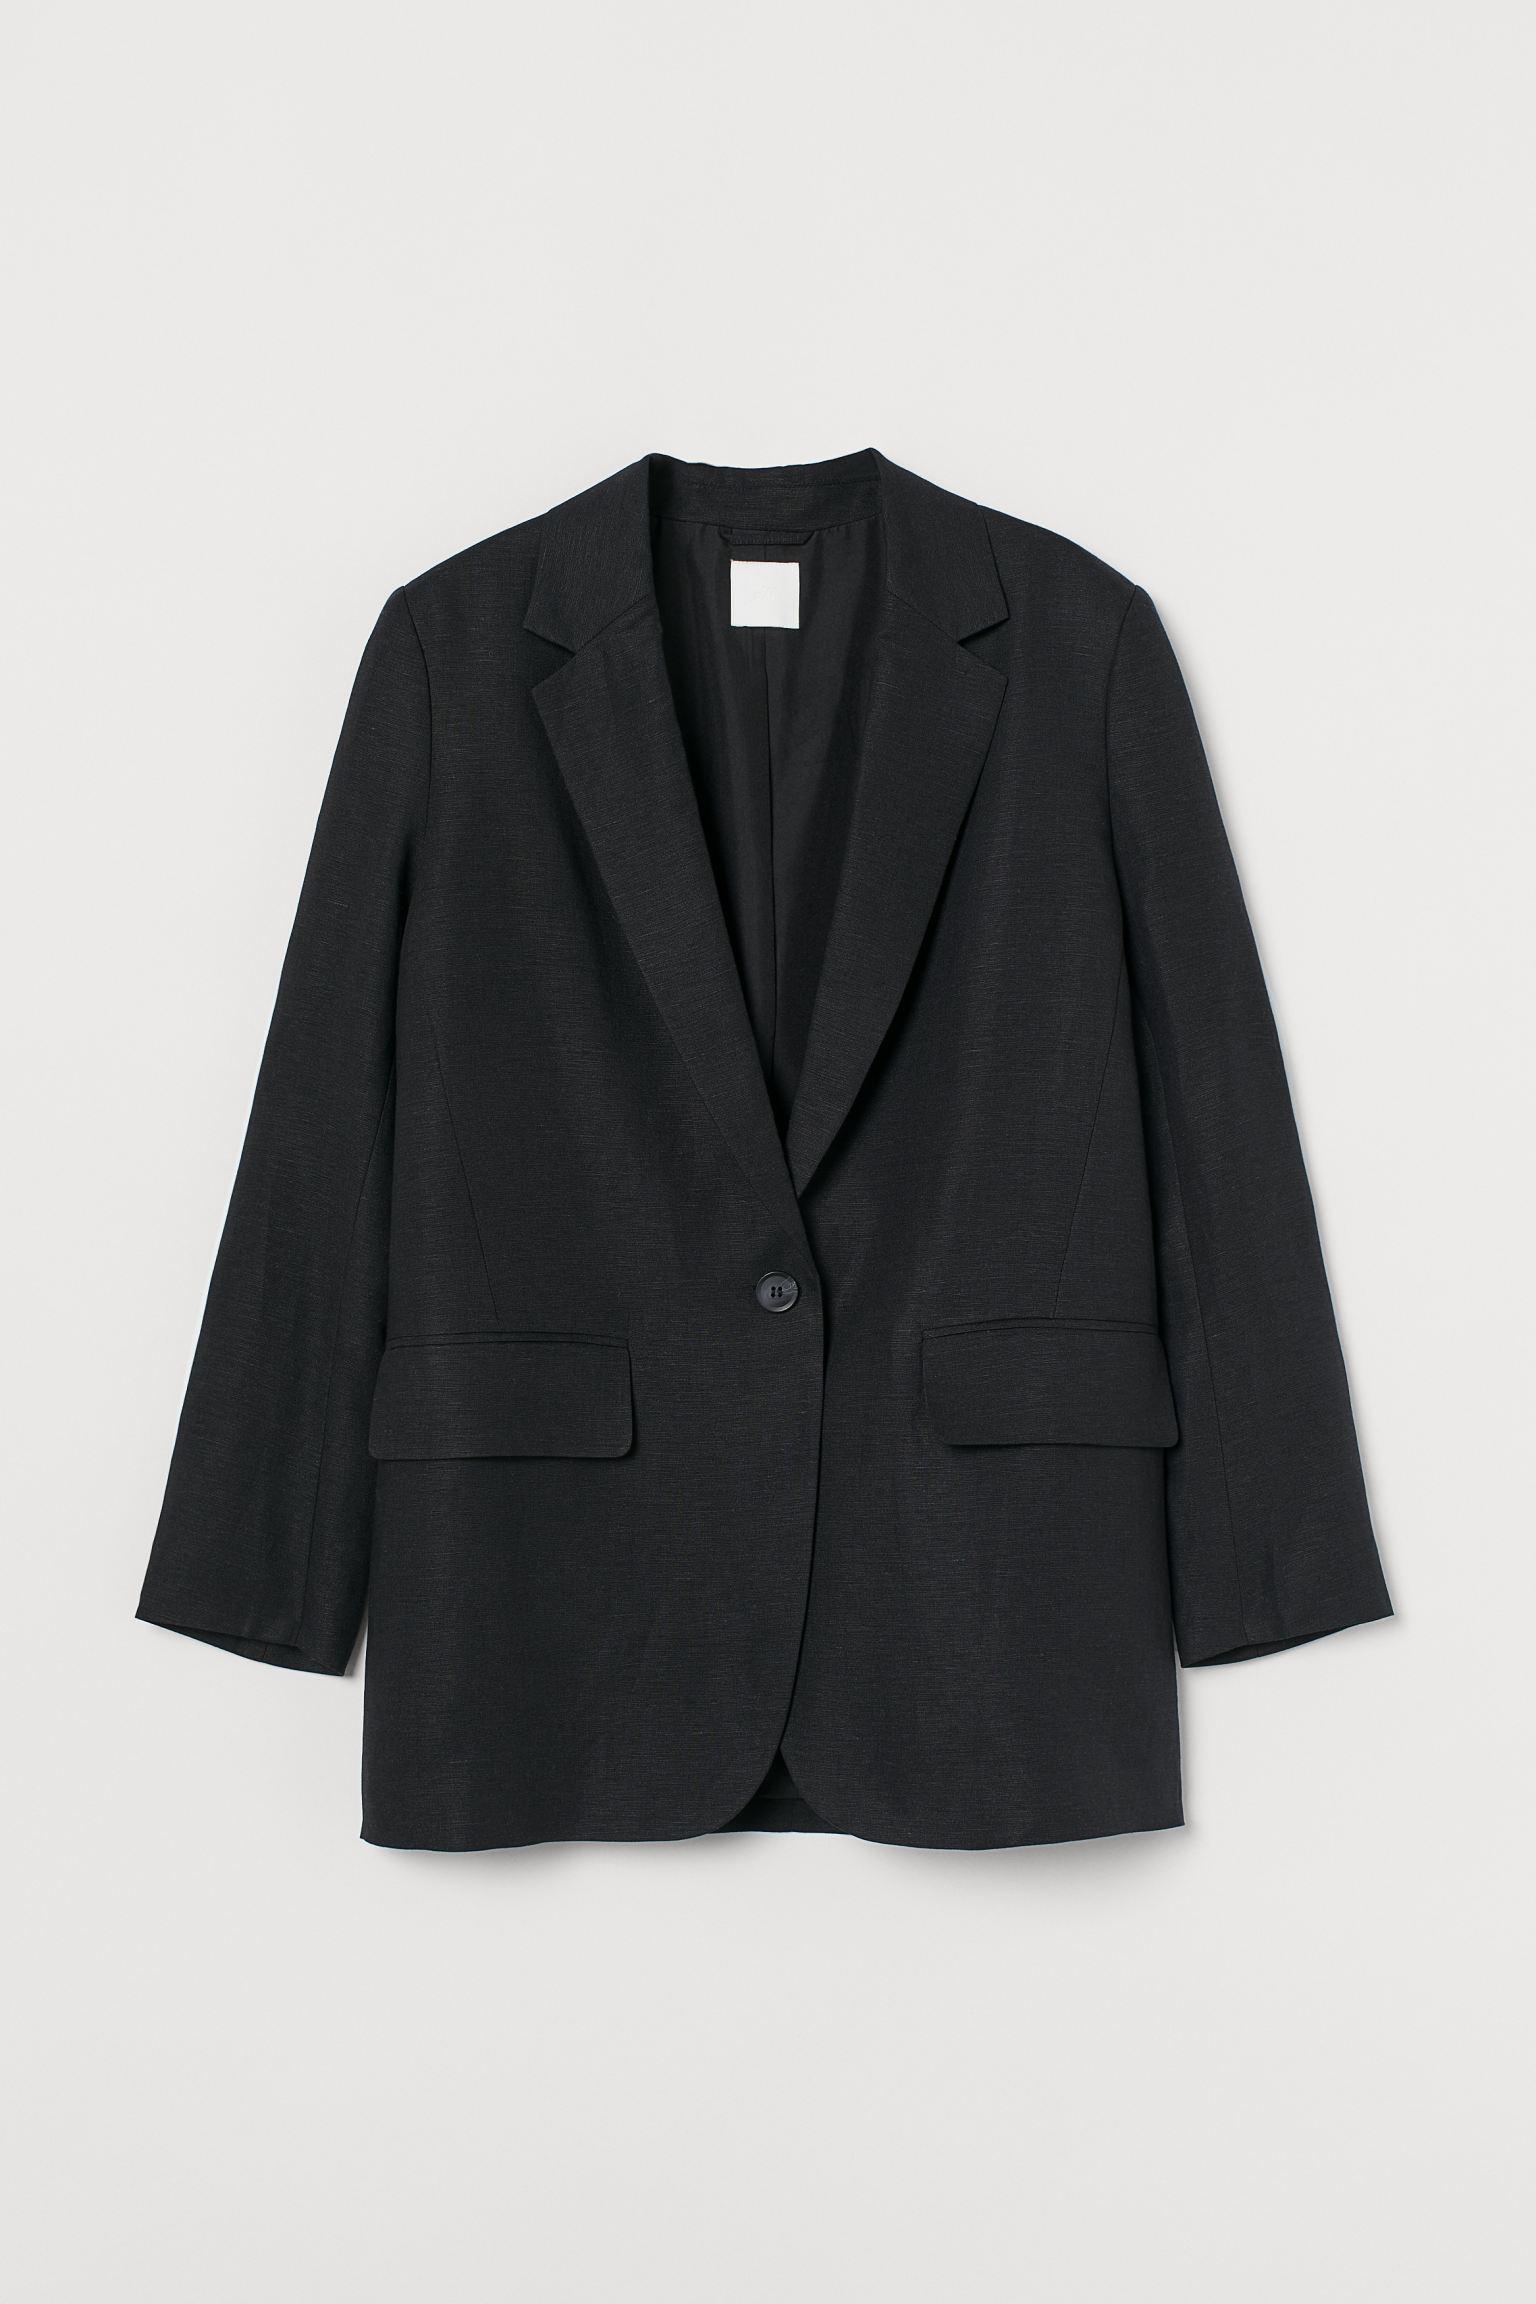 Oversized, svart blazer